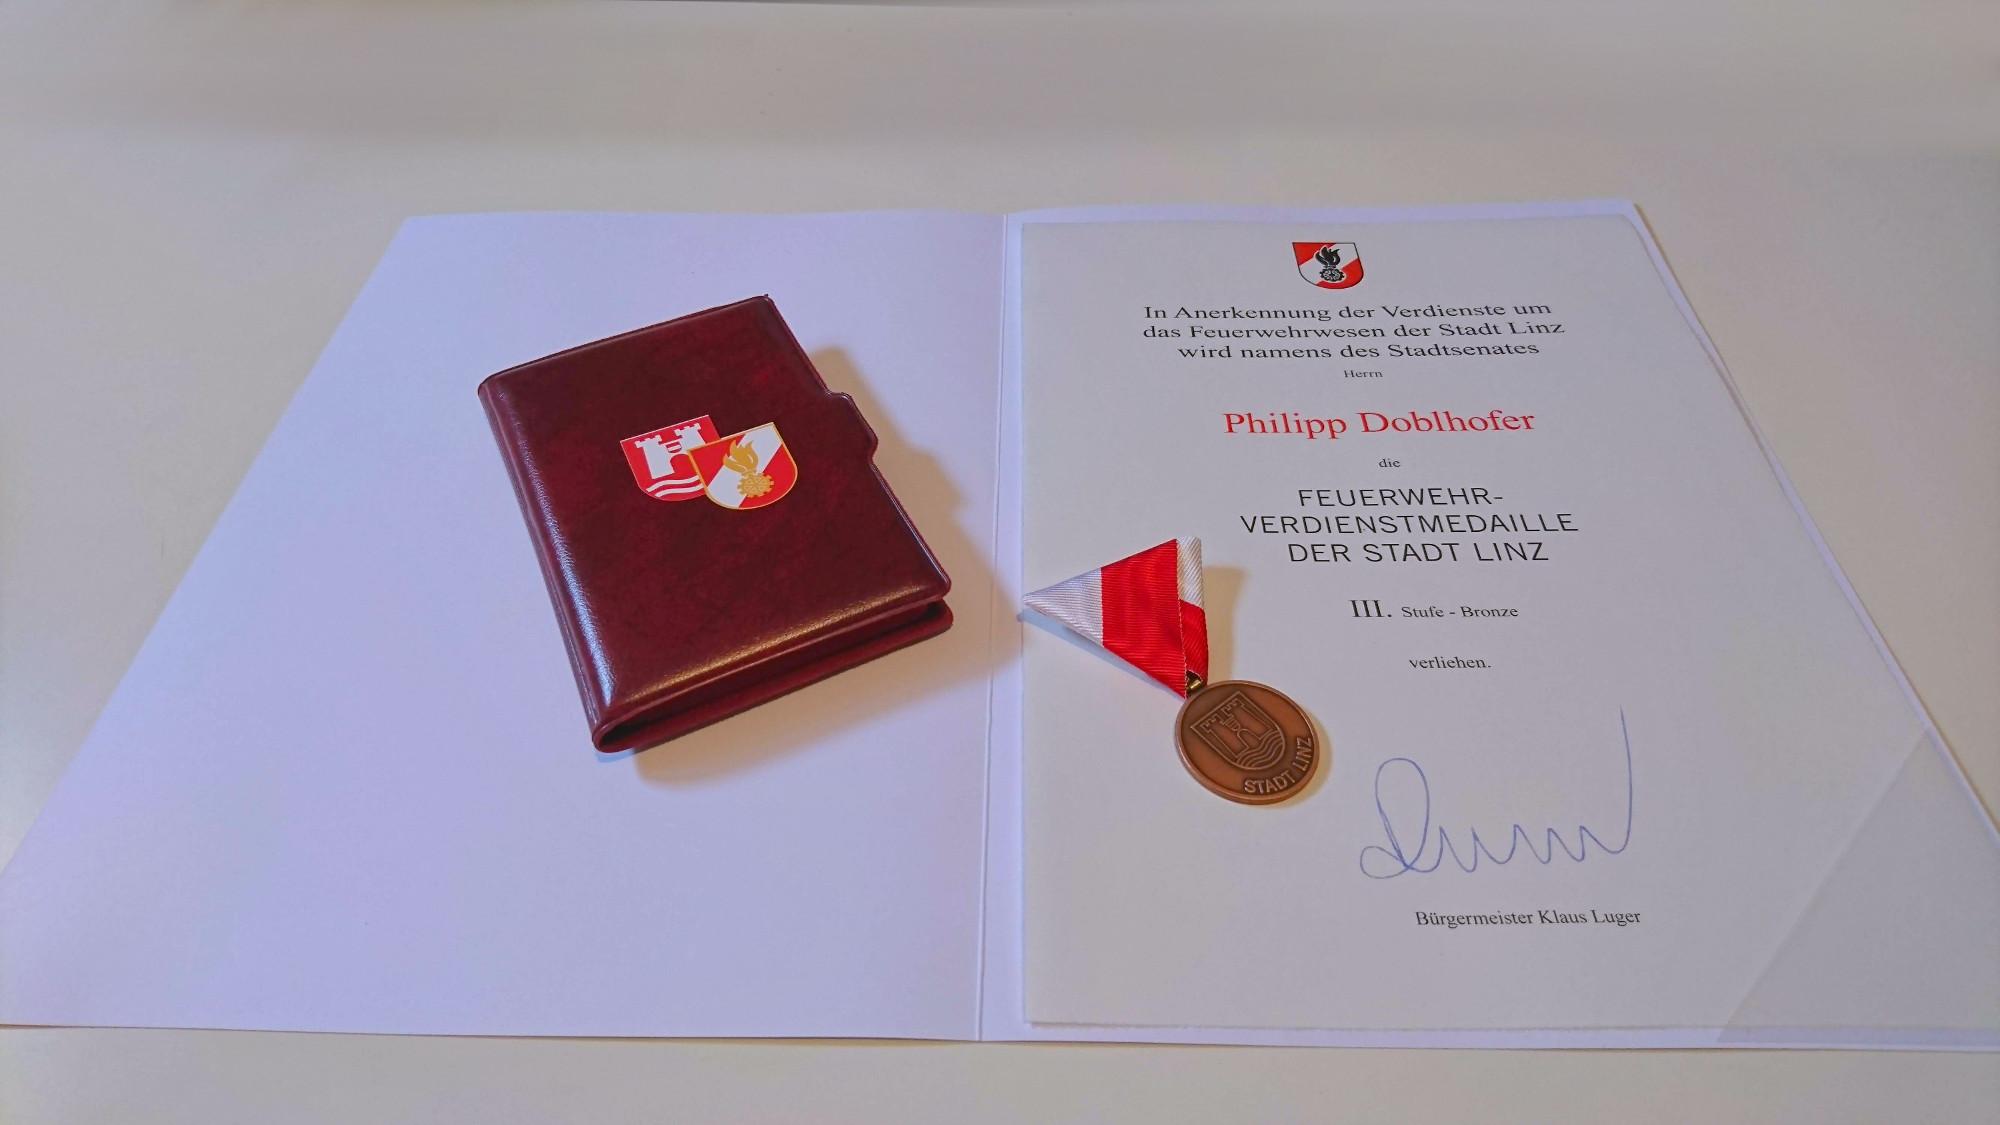 Feuerwehrverdienstmedaille der Stadt Linz – 3. Stufe Bronze